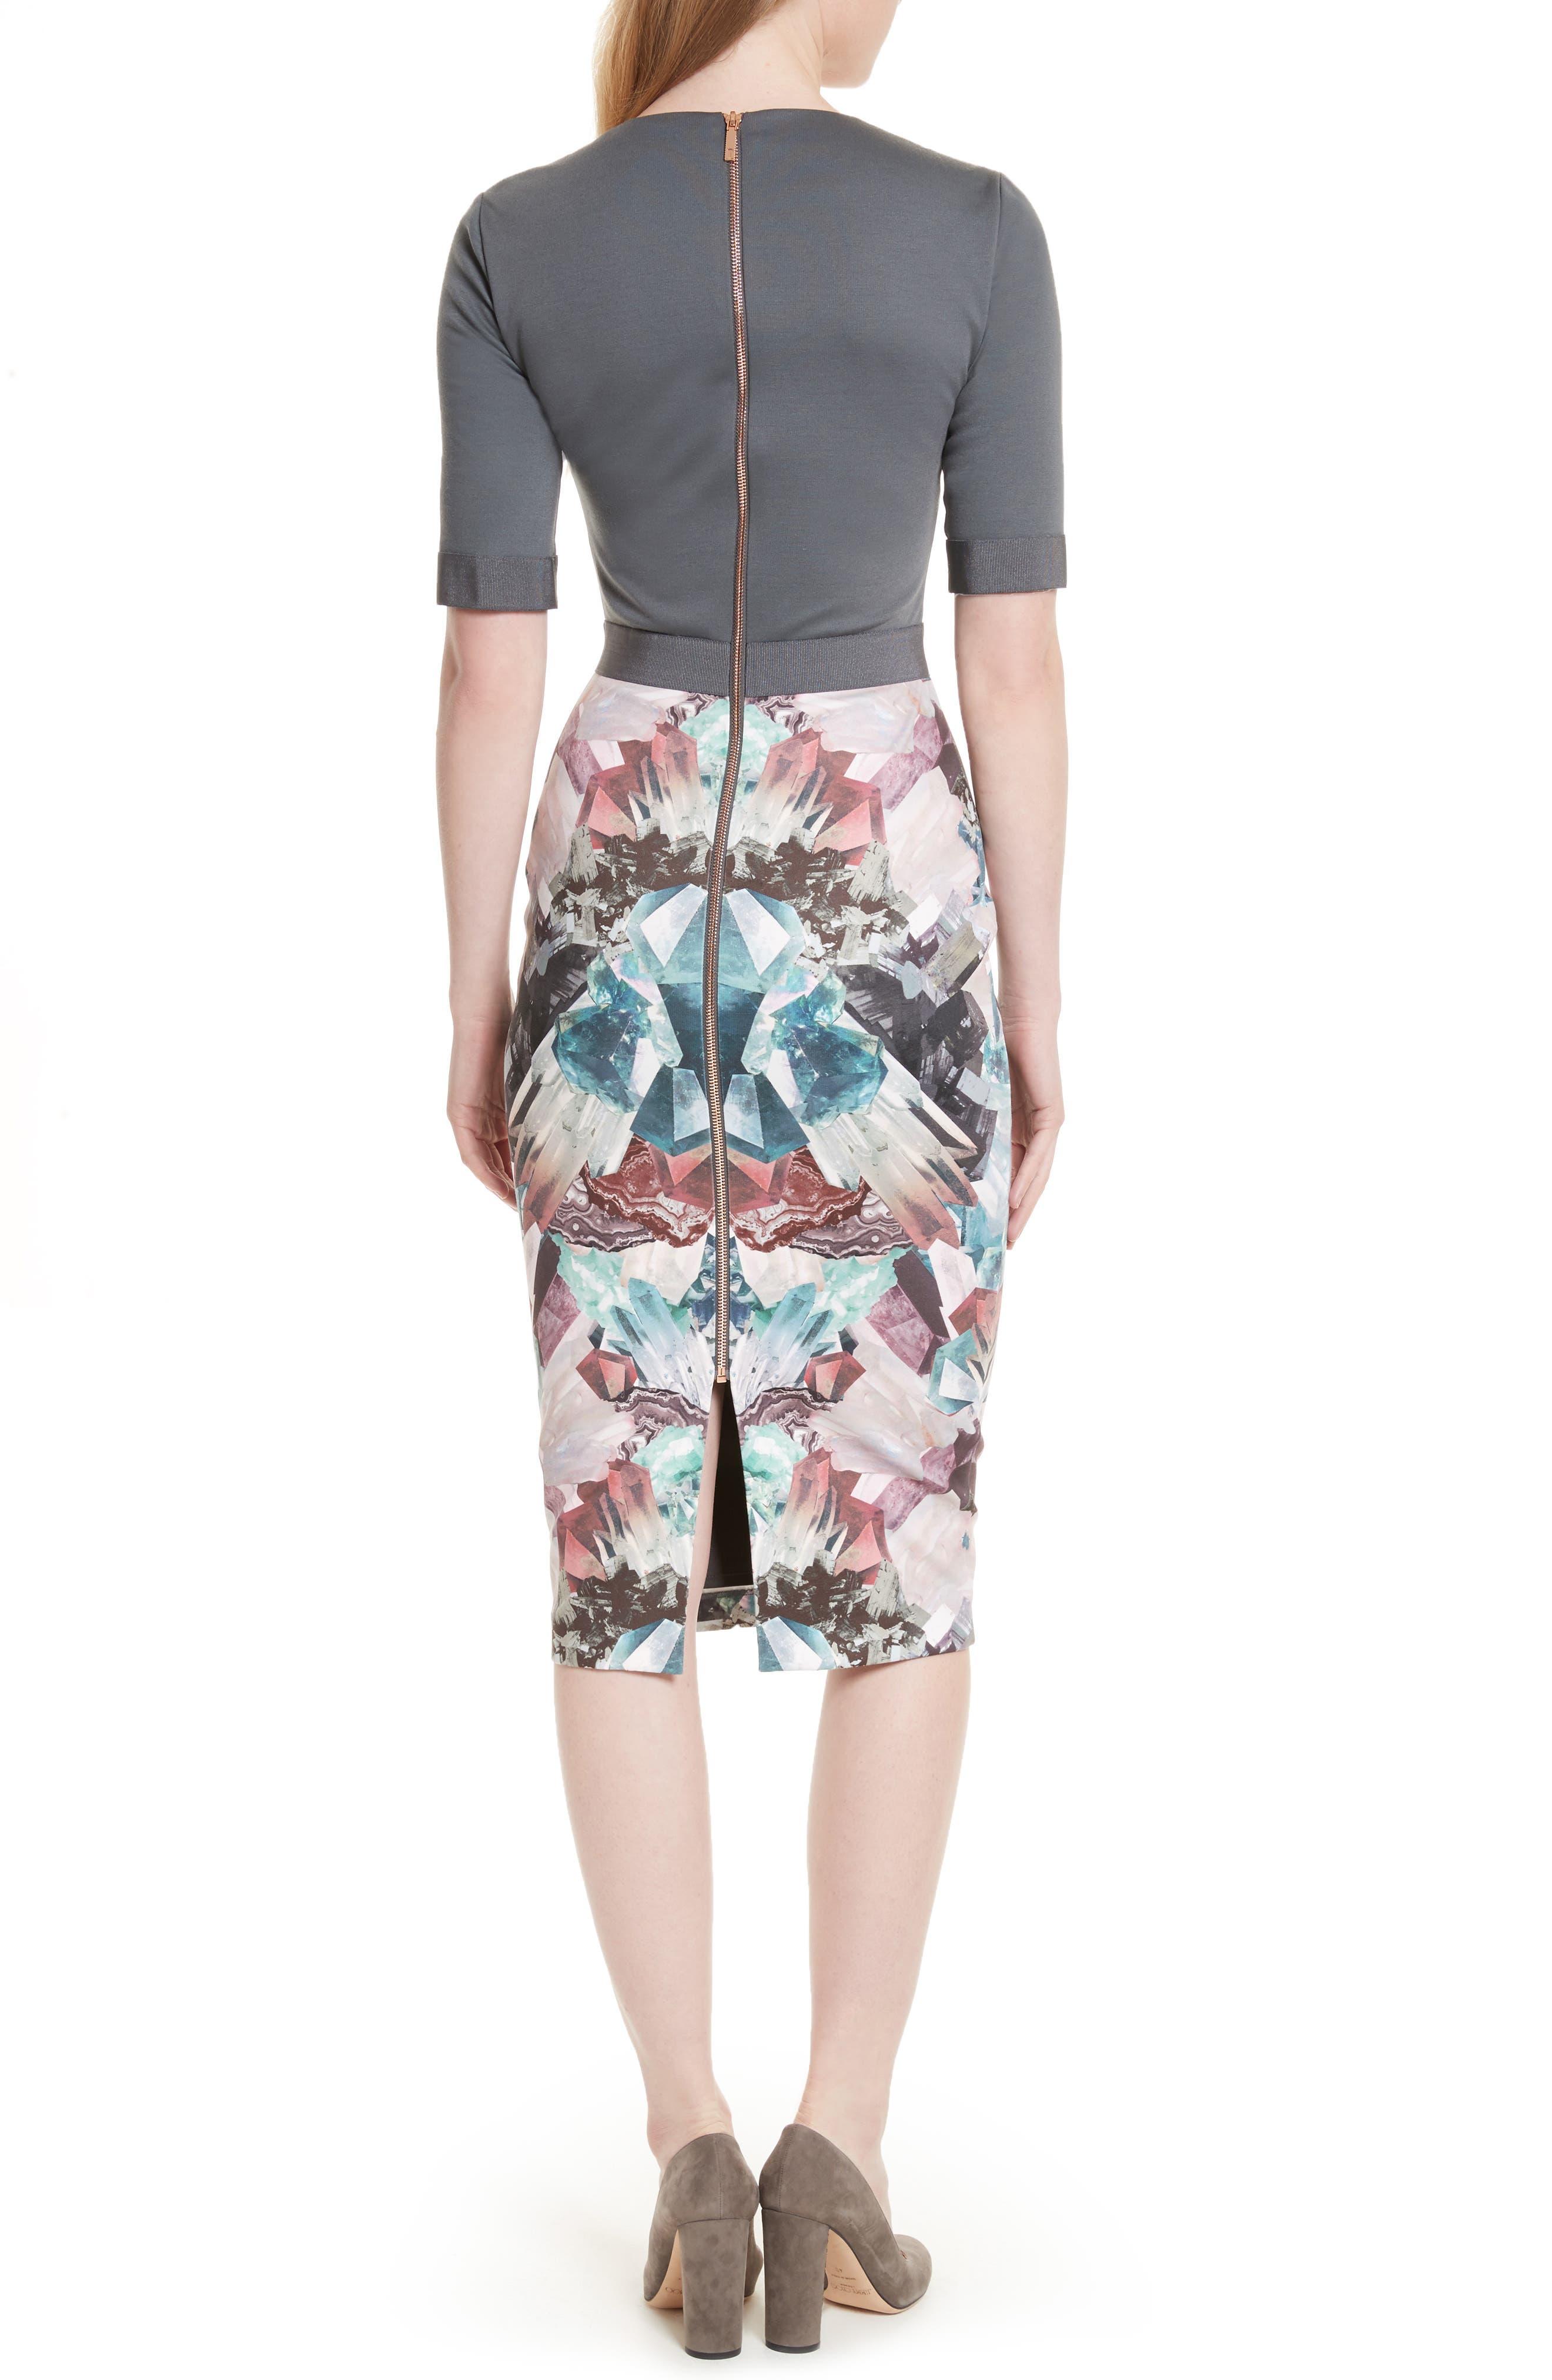 Anaste Mirror Minerals Print Dress,                             Alternate thumbnail 2, color,                             021